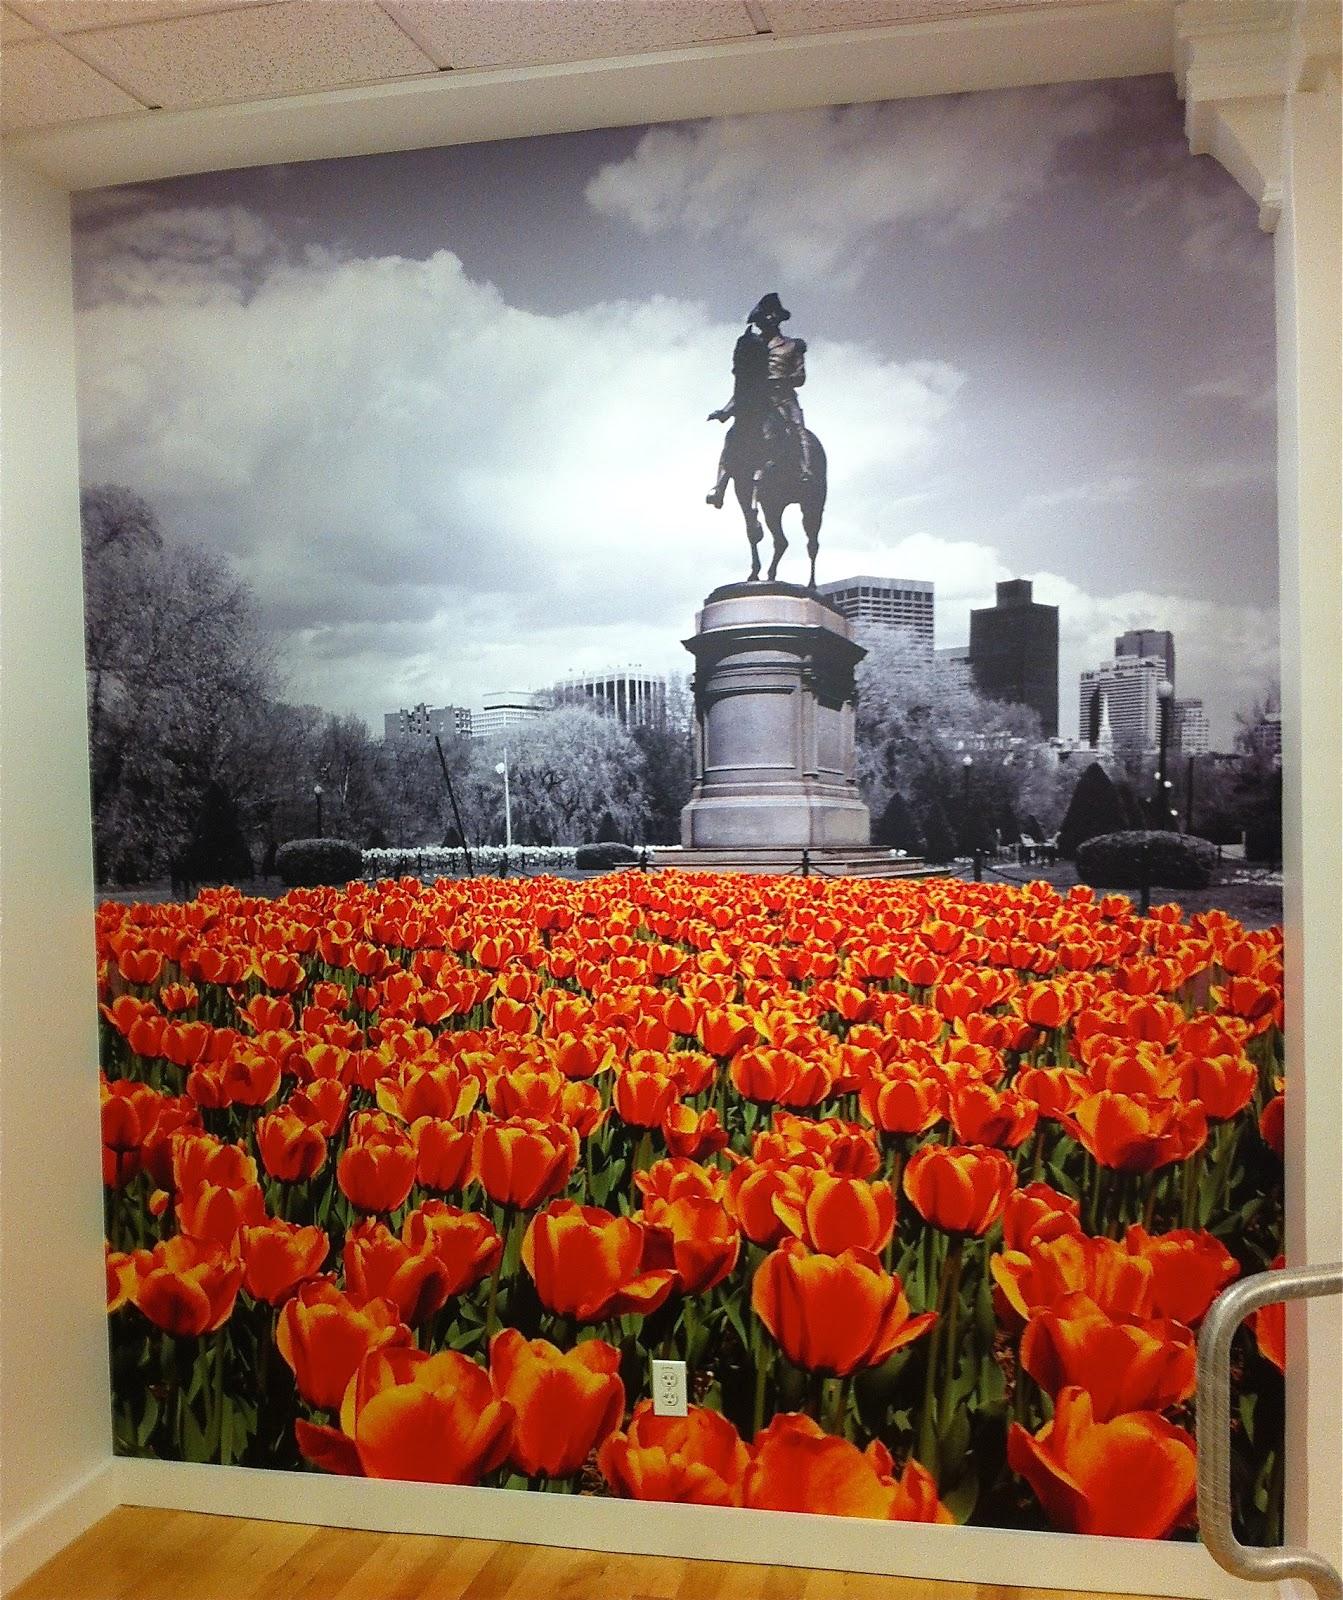 http://1.bp.blogspot.com/-N3WNw7D-4iQ/UPmemNZ3EpI/AAAAAAAAAP4/TvnPQrtfokM/s1600/a1_Custom_Wallpaper_Mural_Boston.jpg